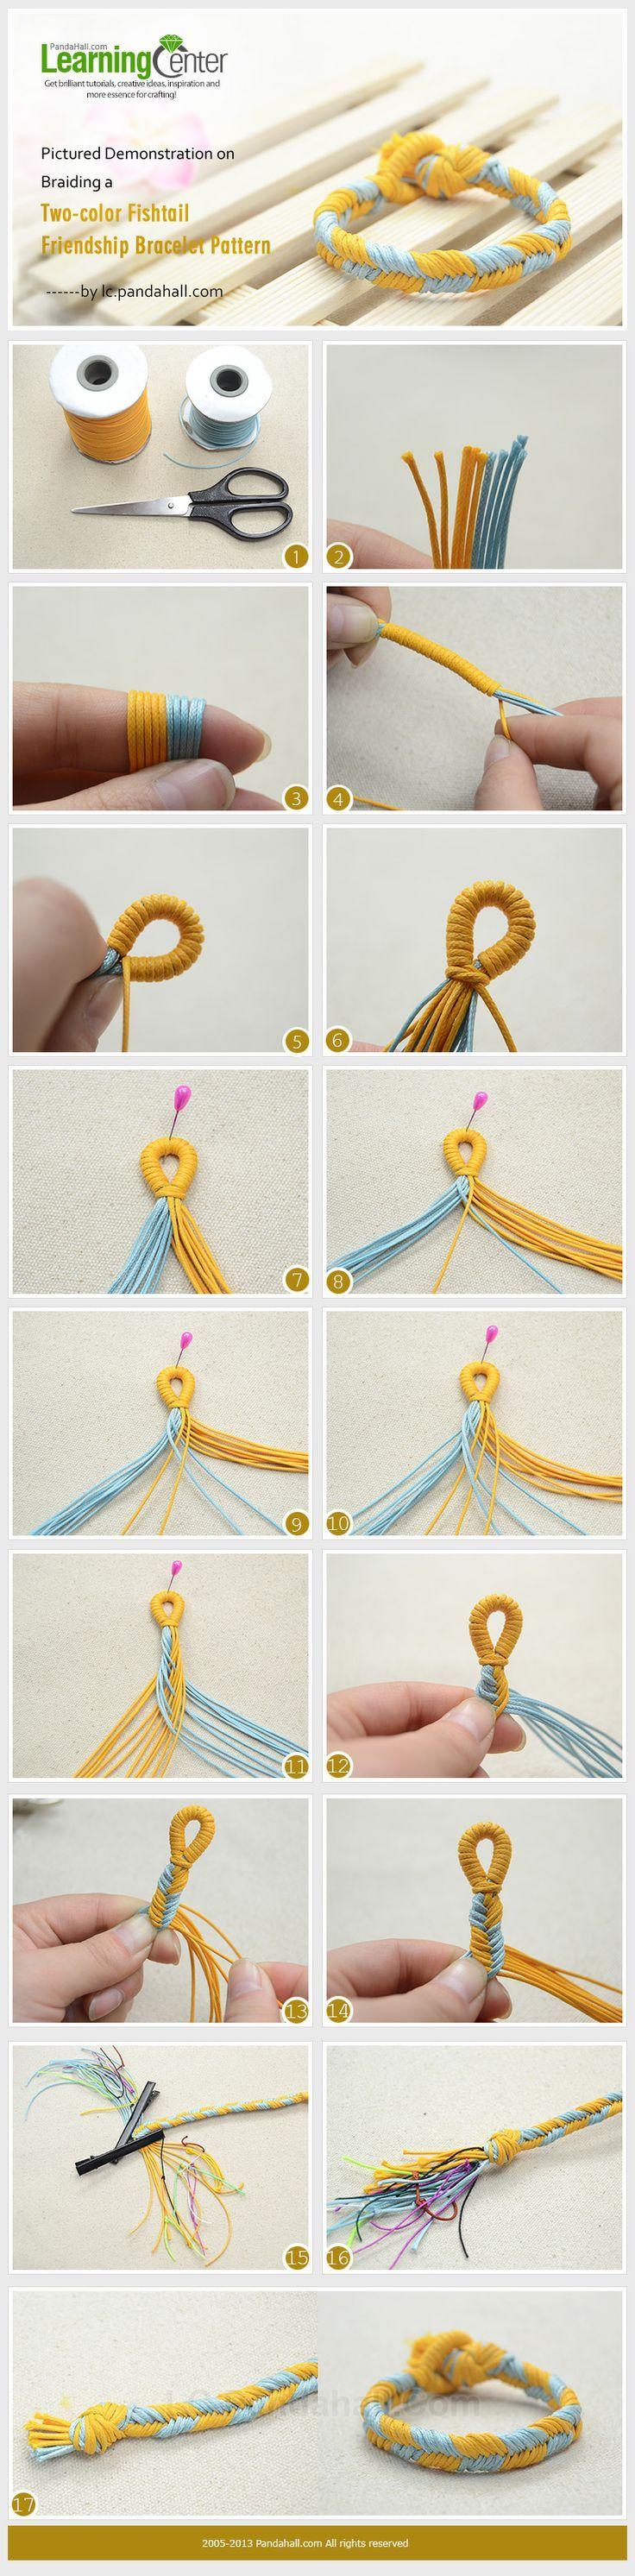 Pictured Demonstration on Braiding a Two-color Fishtail Friendship Bracelet Patt...